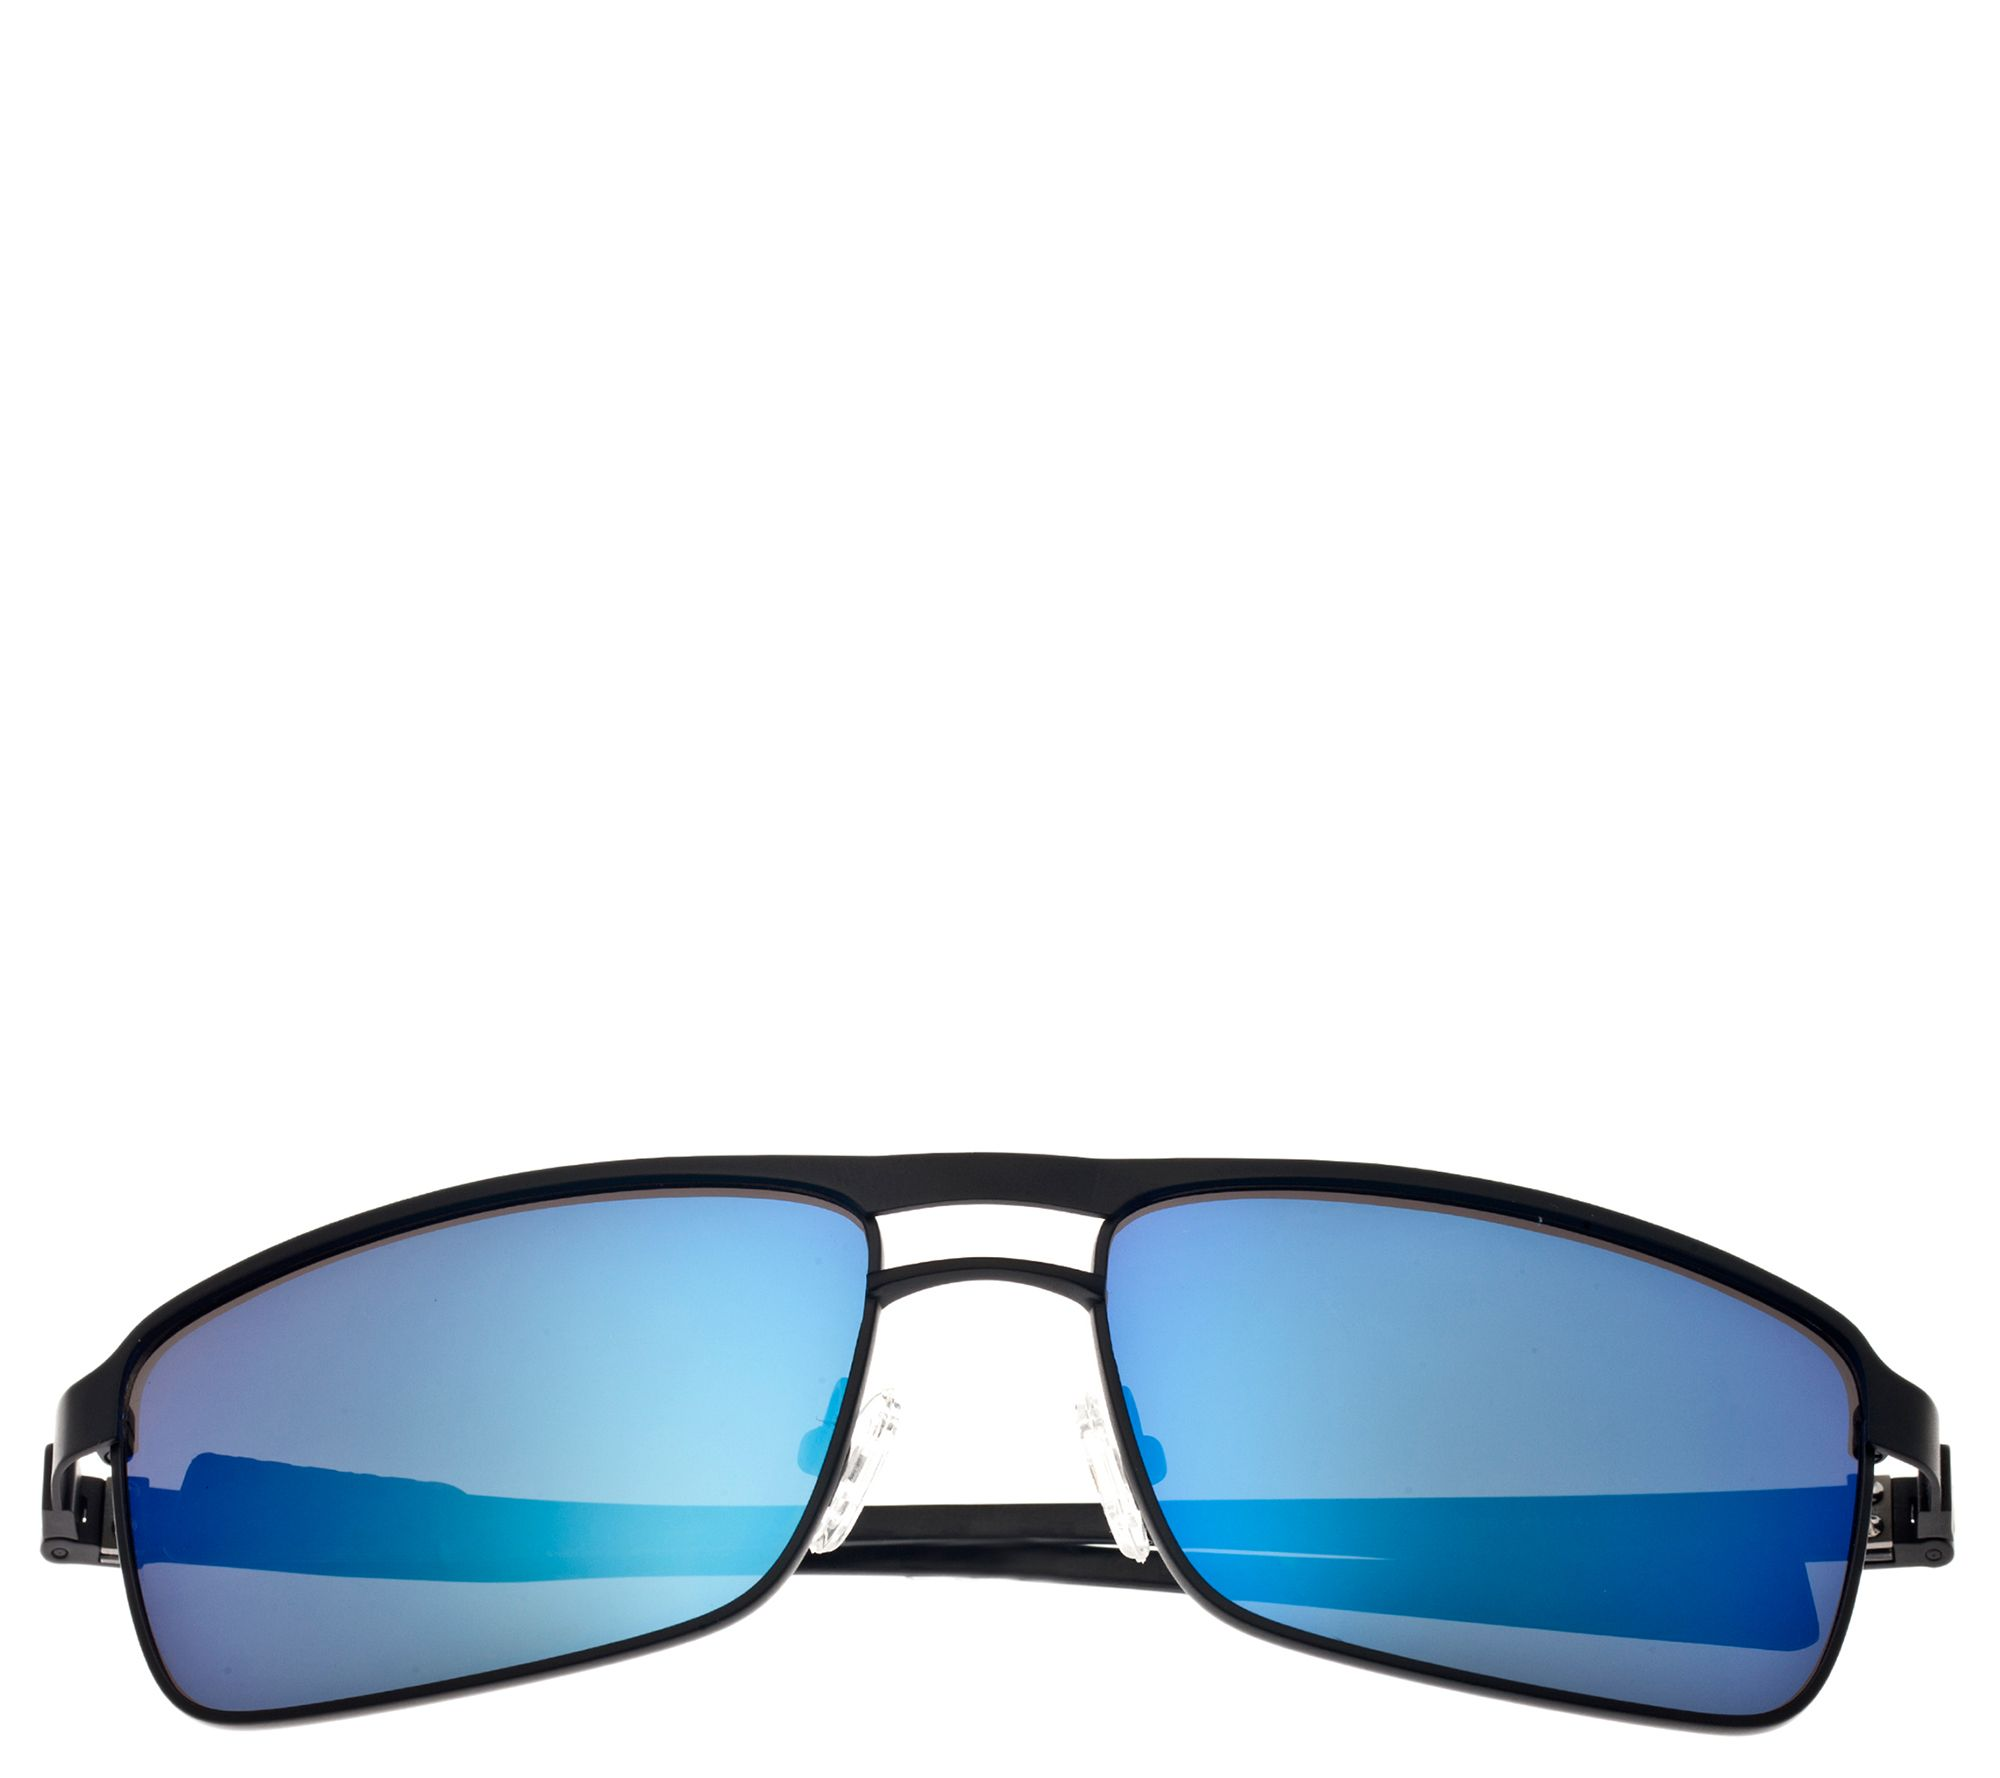 8491aeb97f Breed Taurus Carbon Fiber Polarized Men s Sunglasses — QVC.com